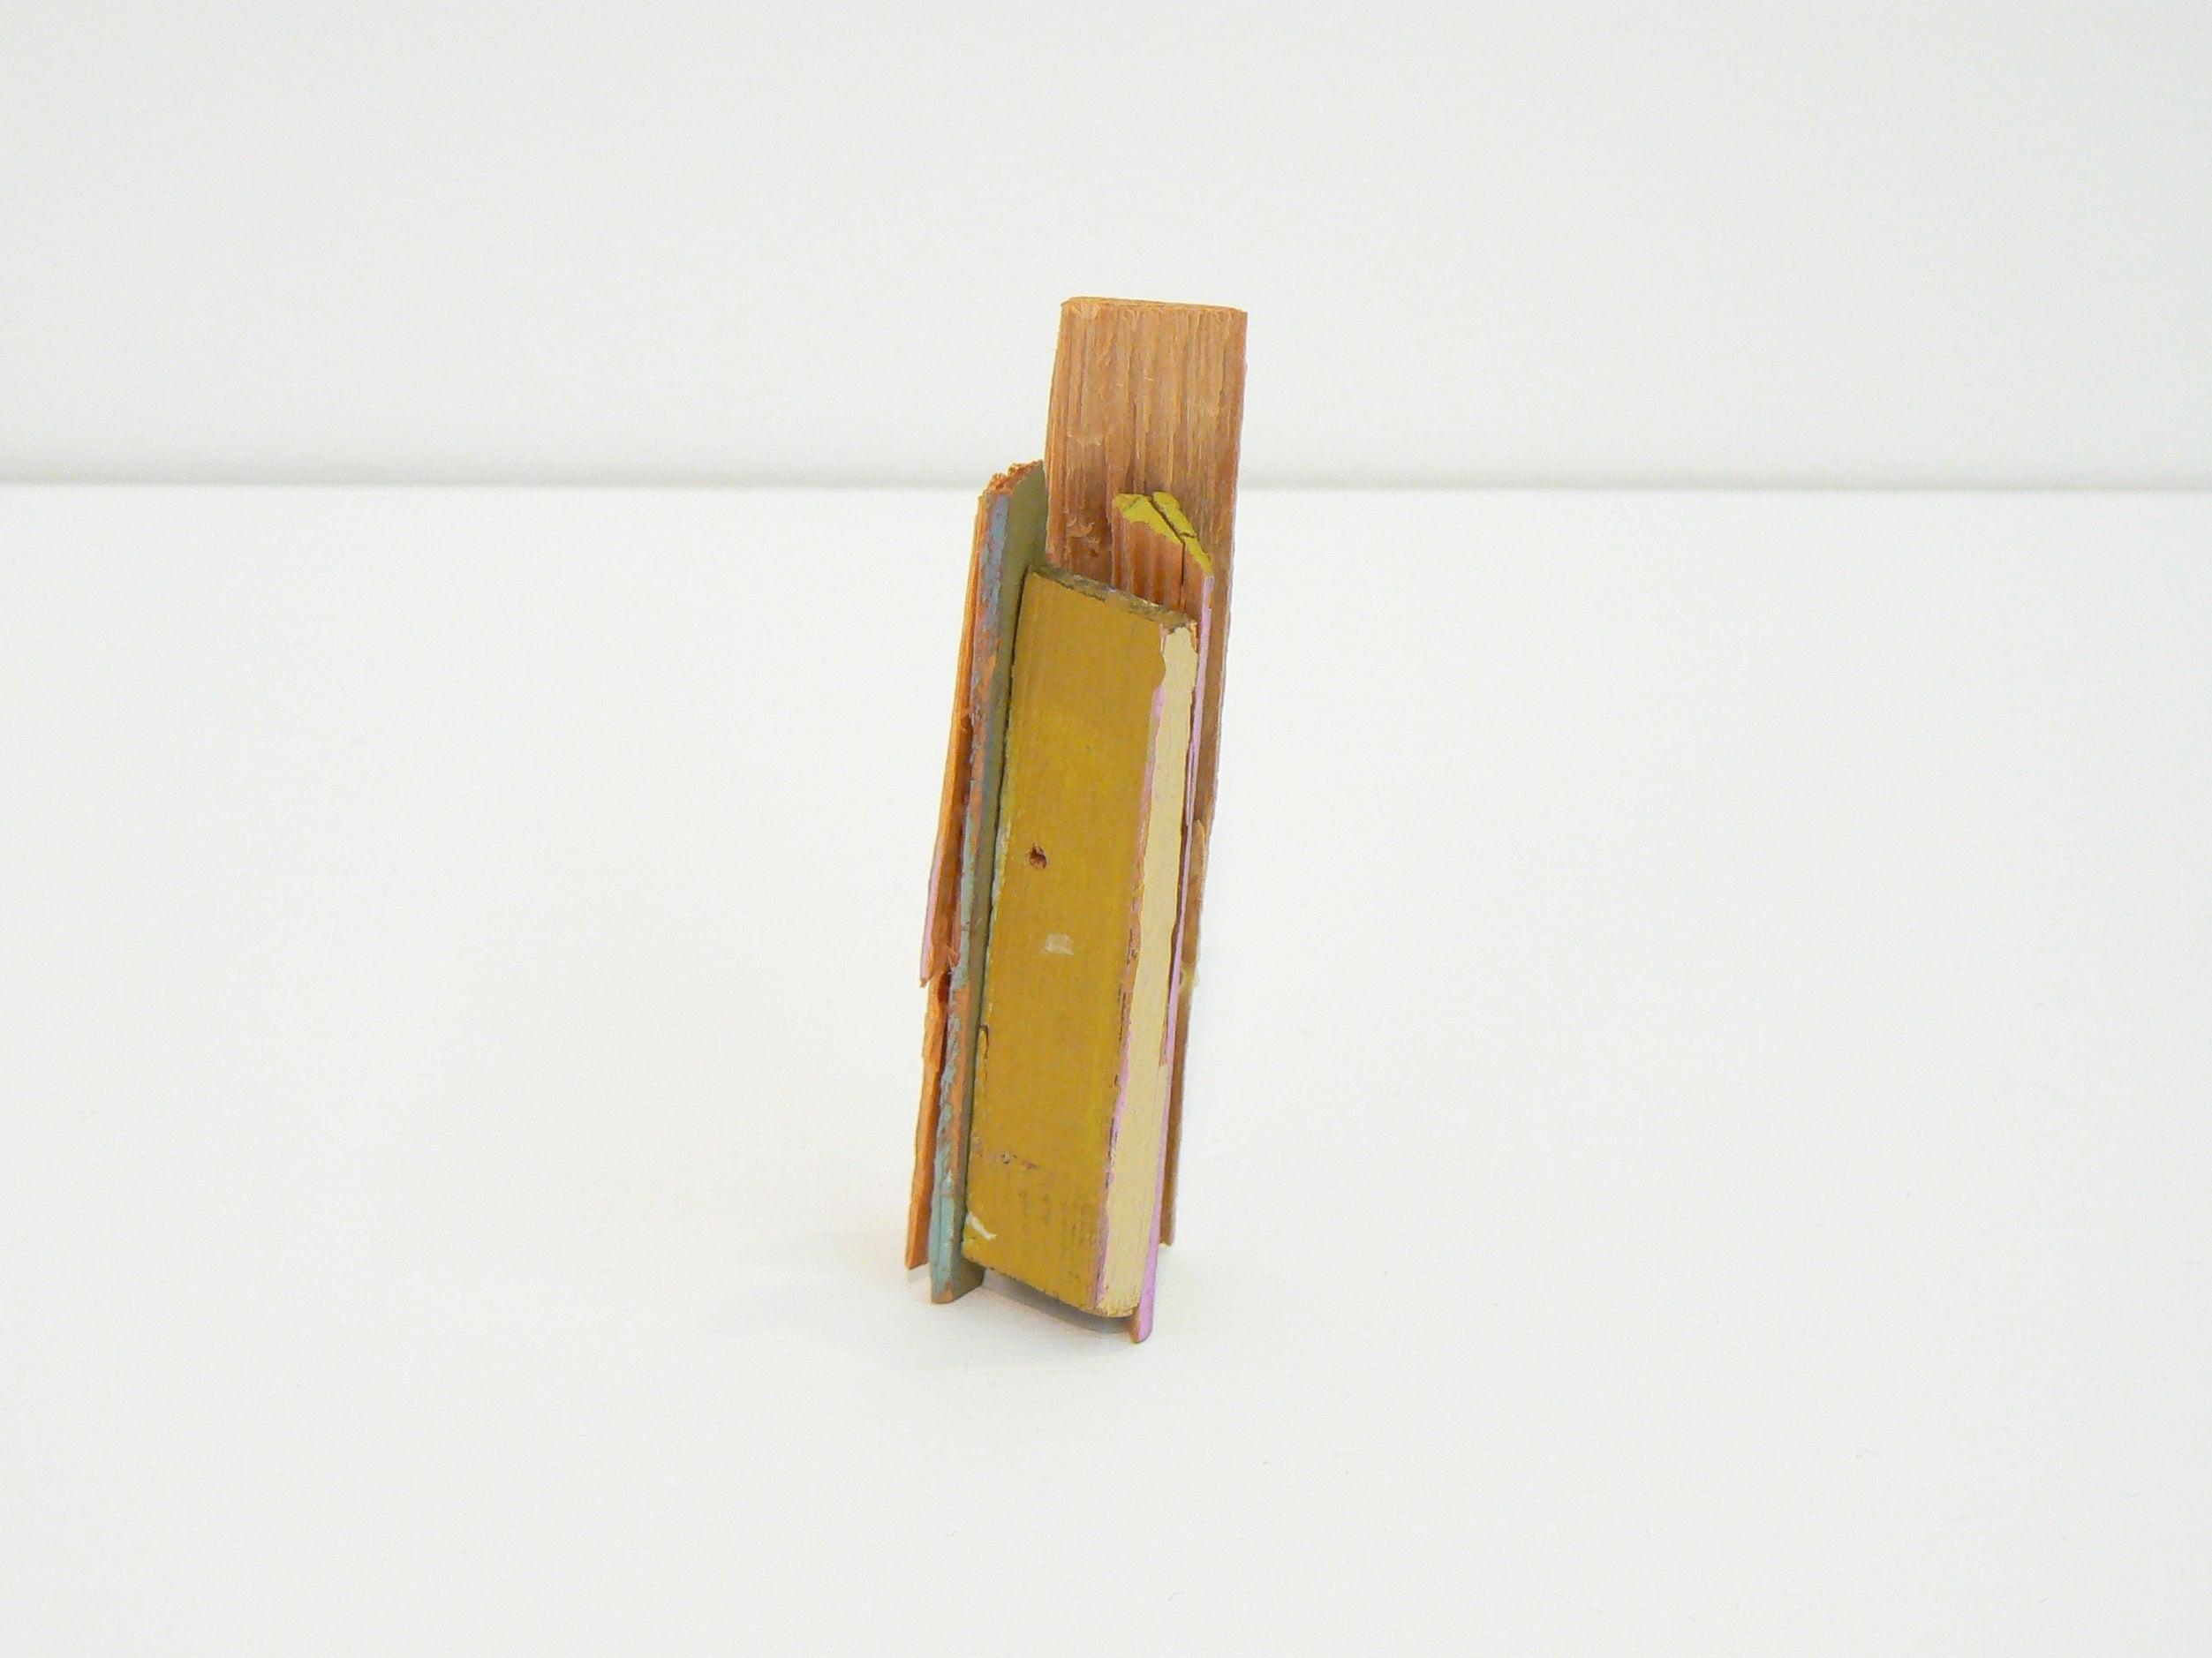 Liz Sweibel, Untitled (Scrapings #3), 2016, Wood, Paint, Found Objects